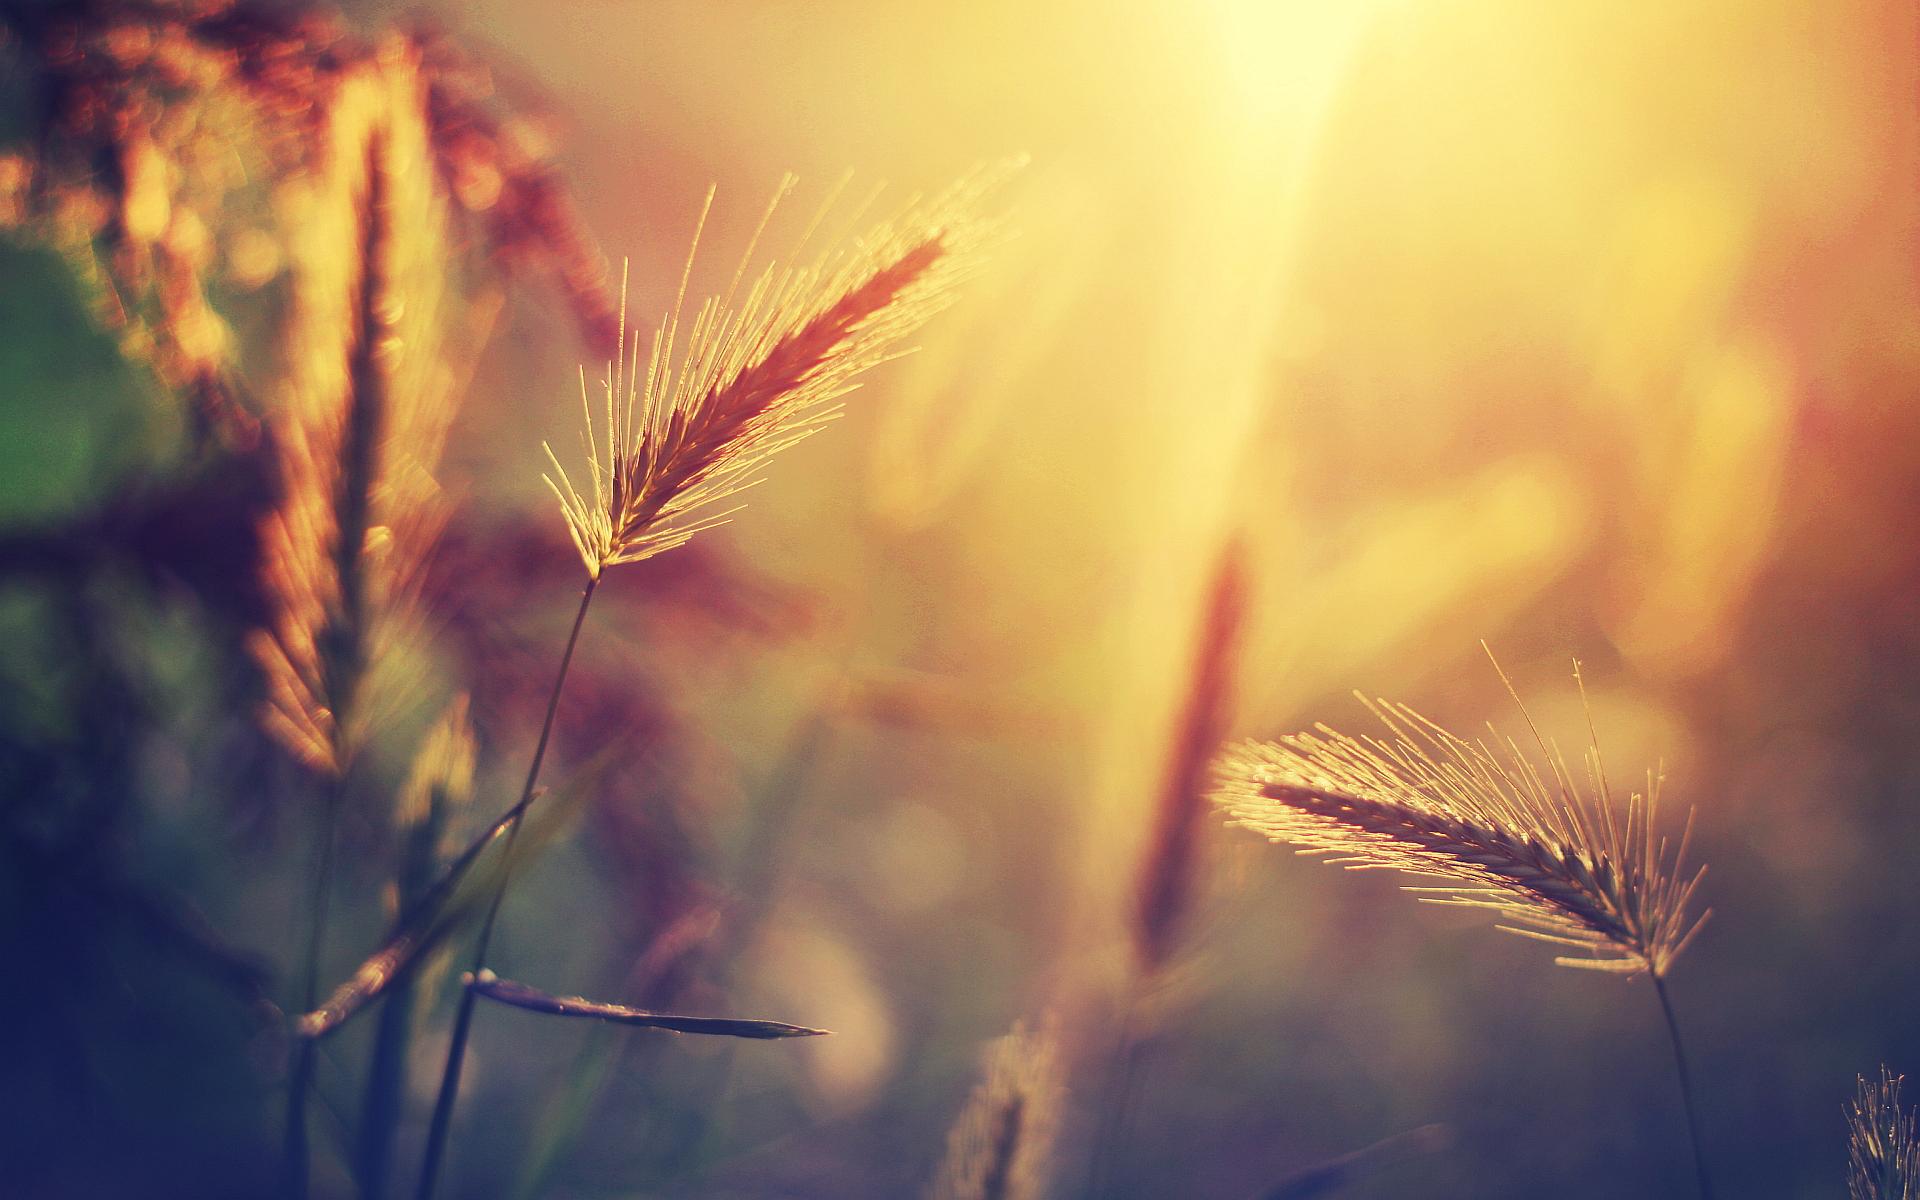 sunset images grass